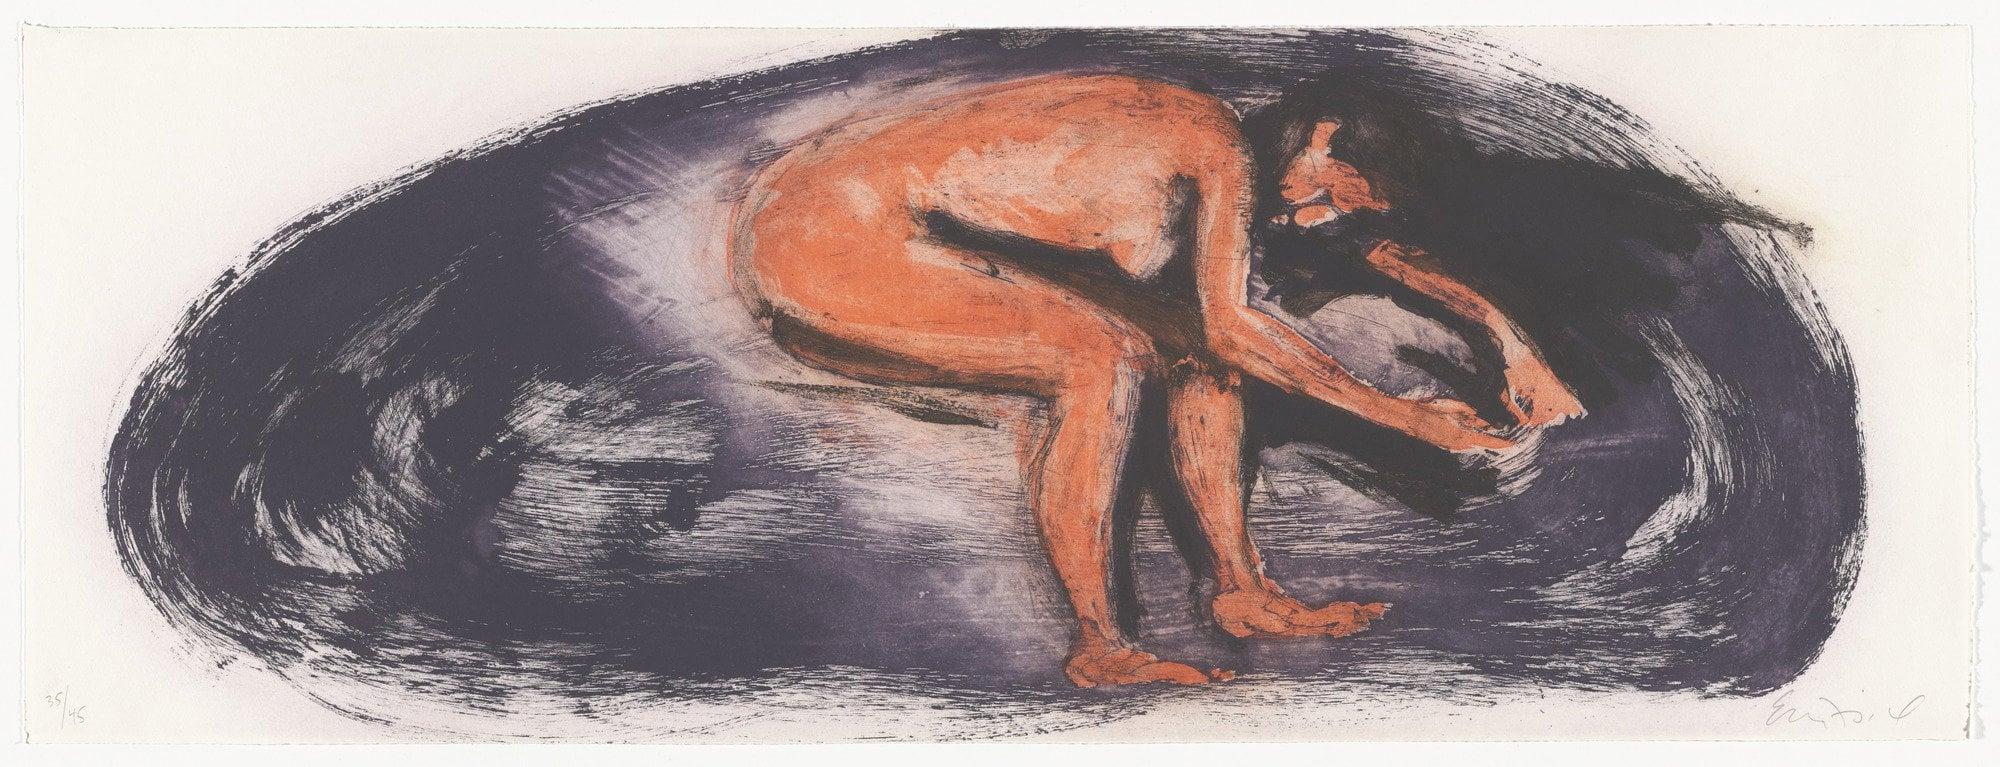 "Untitled, 1985. Aquatint. 11 5/8 x 31 5/8"" (29.5 x 80.3cm)"